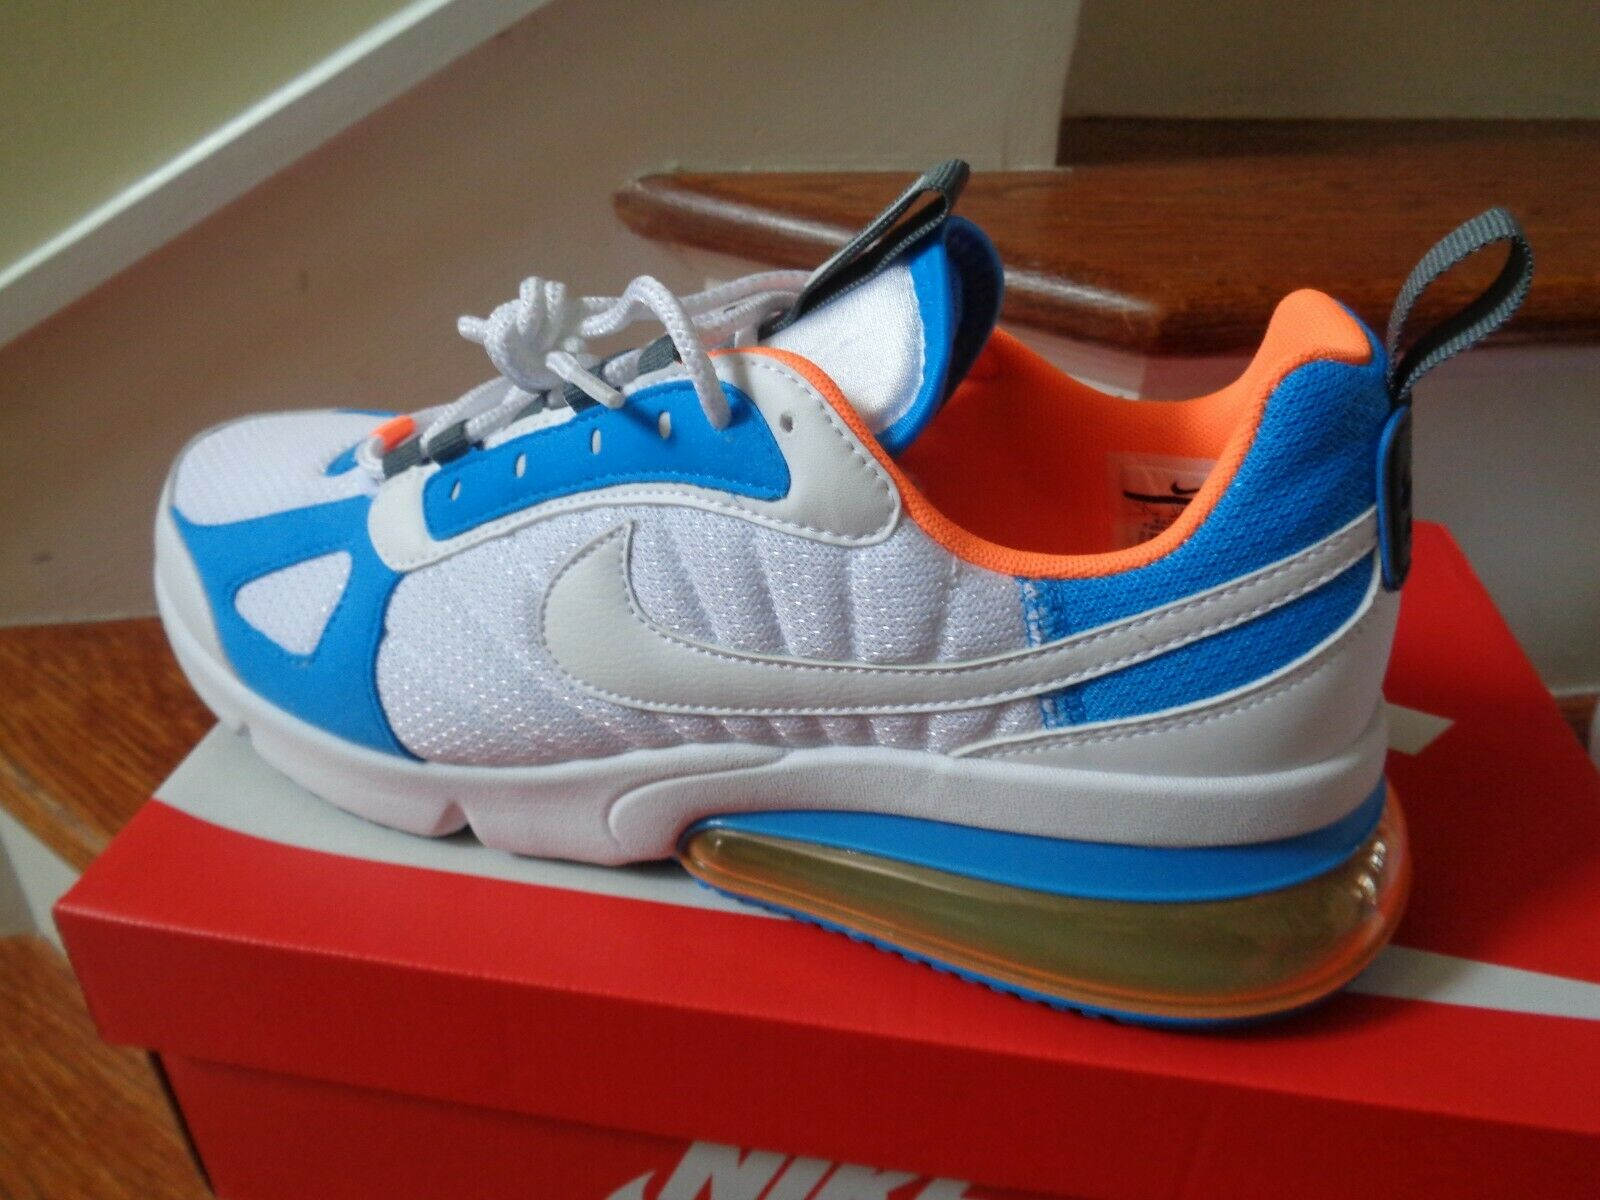 5e4c6194944 Nike Air Max 270 Futura Men's Running shoes, AO1569 100 NWB Size 9 ...